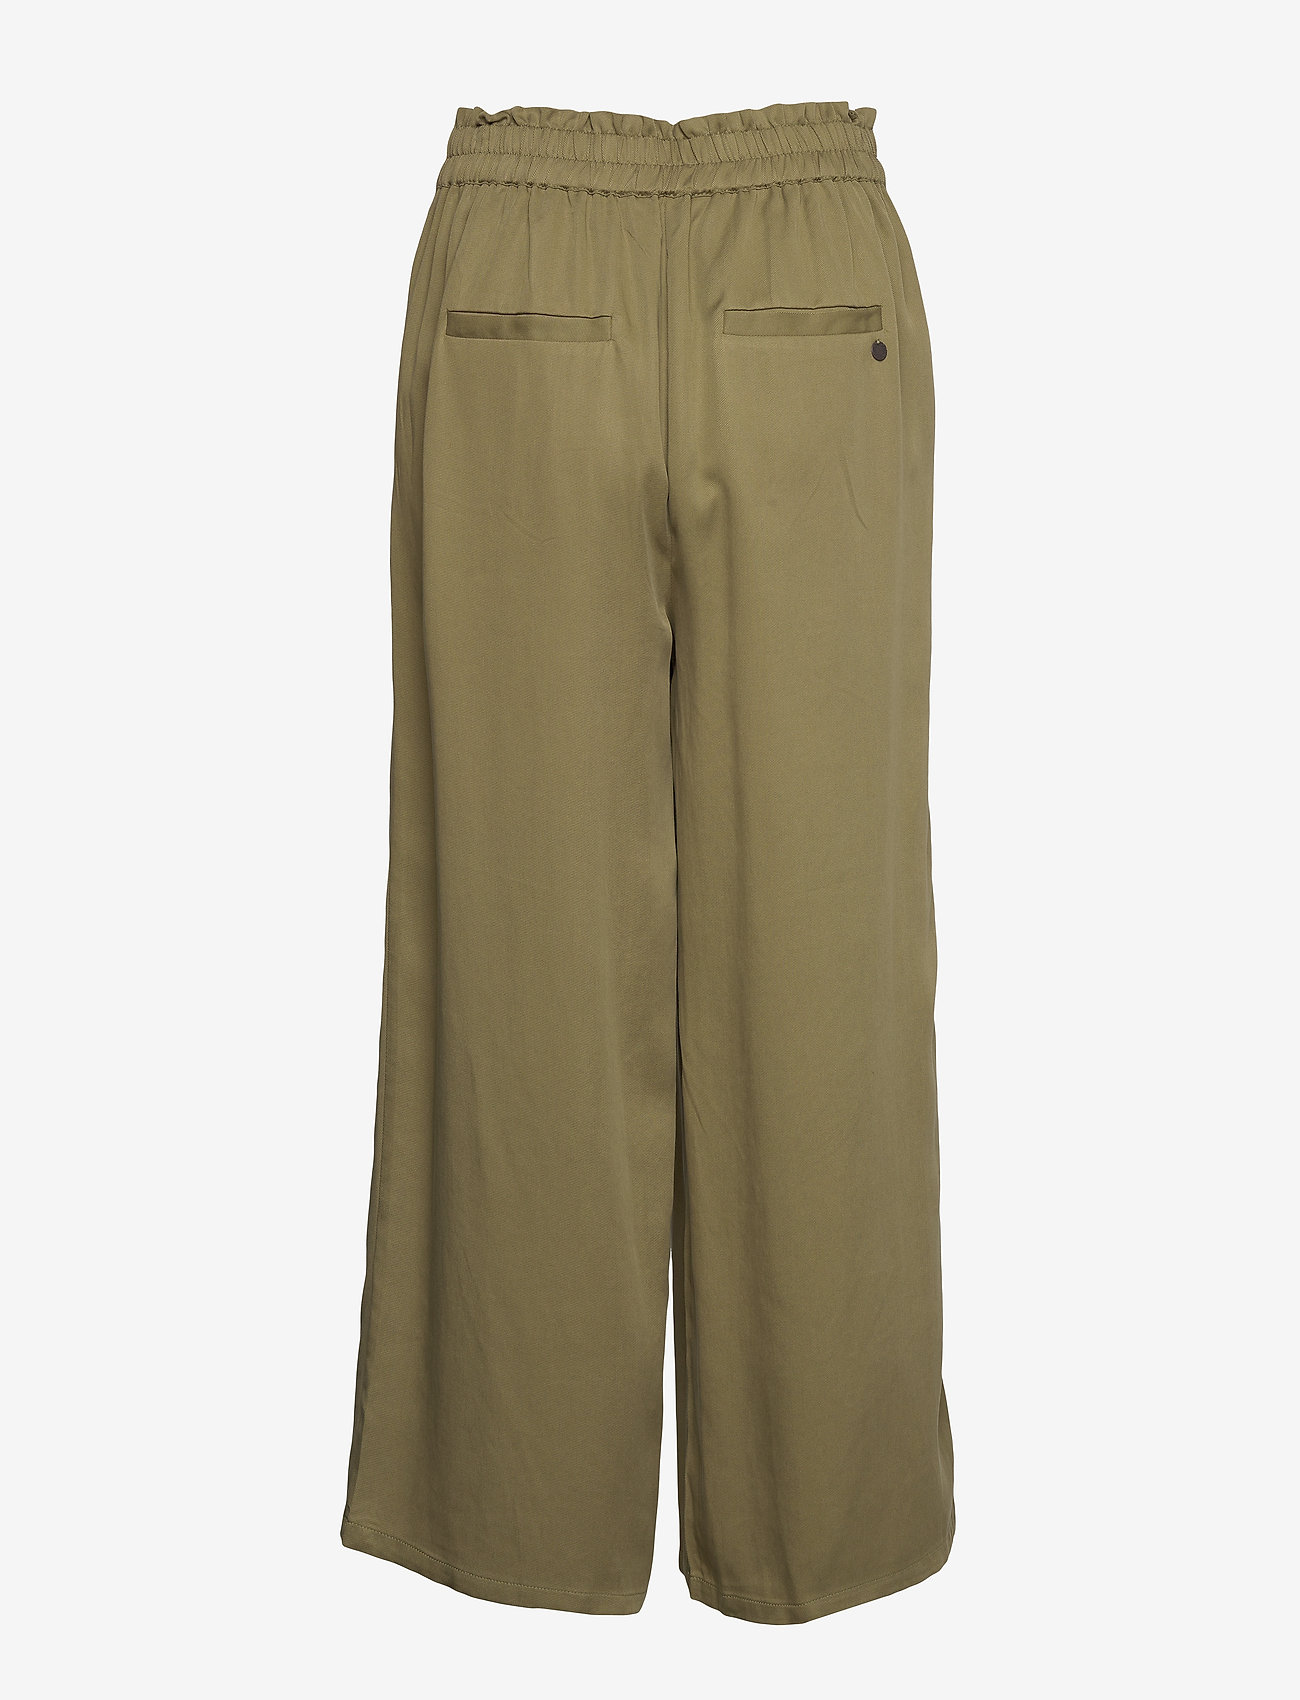 Nuaraluen Pants (M. Olive) - Nümph si5gHA